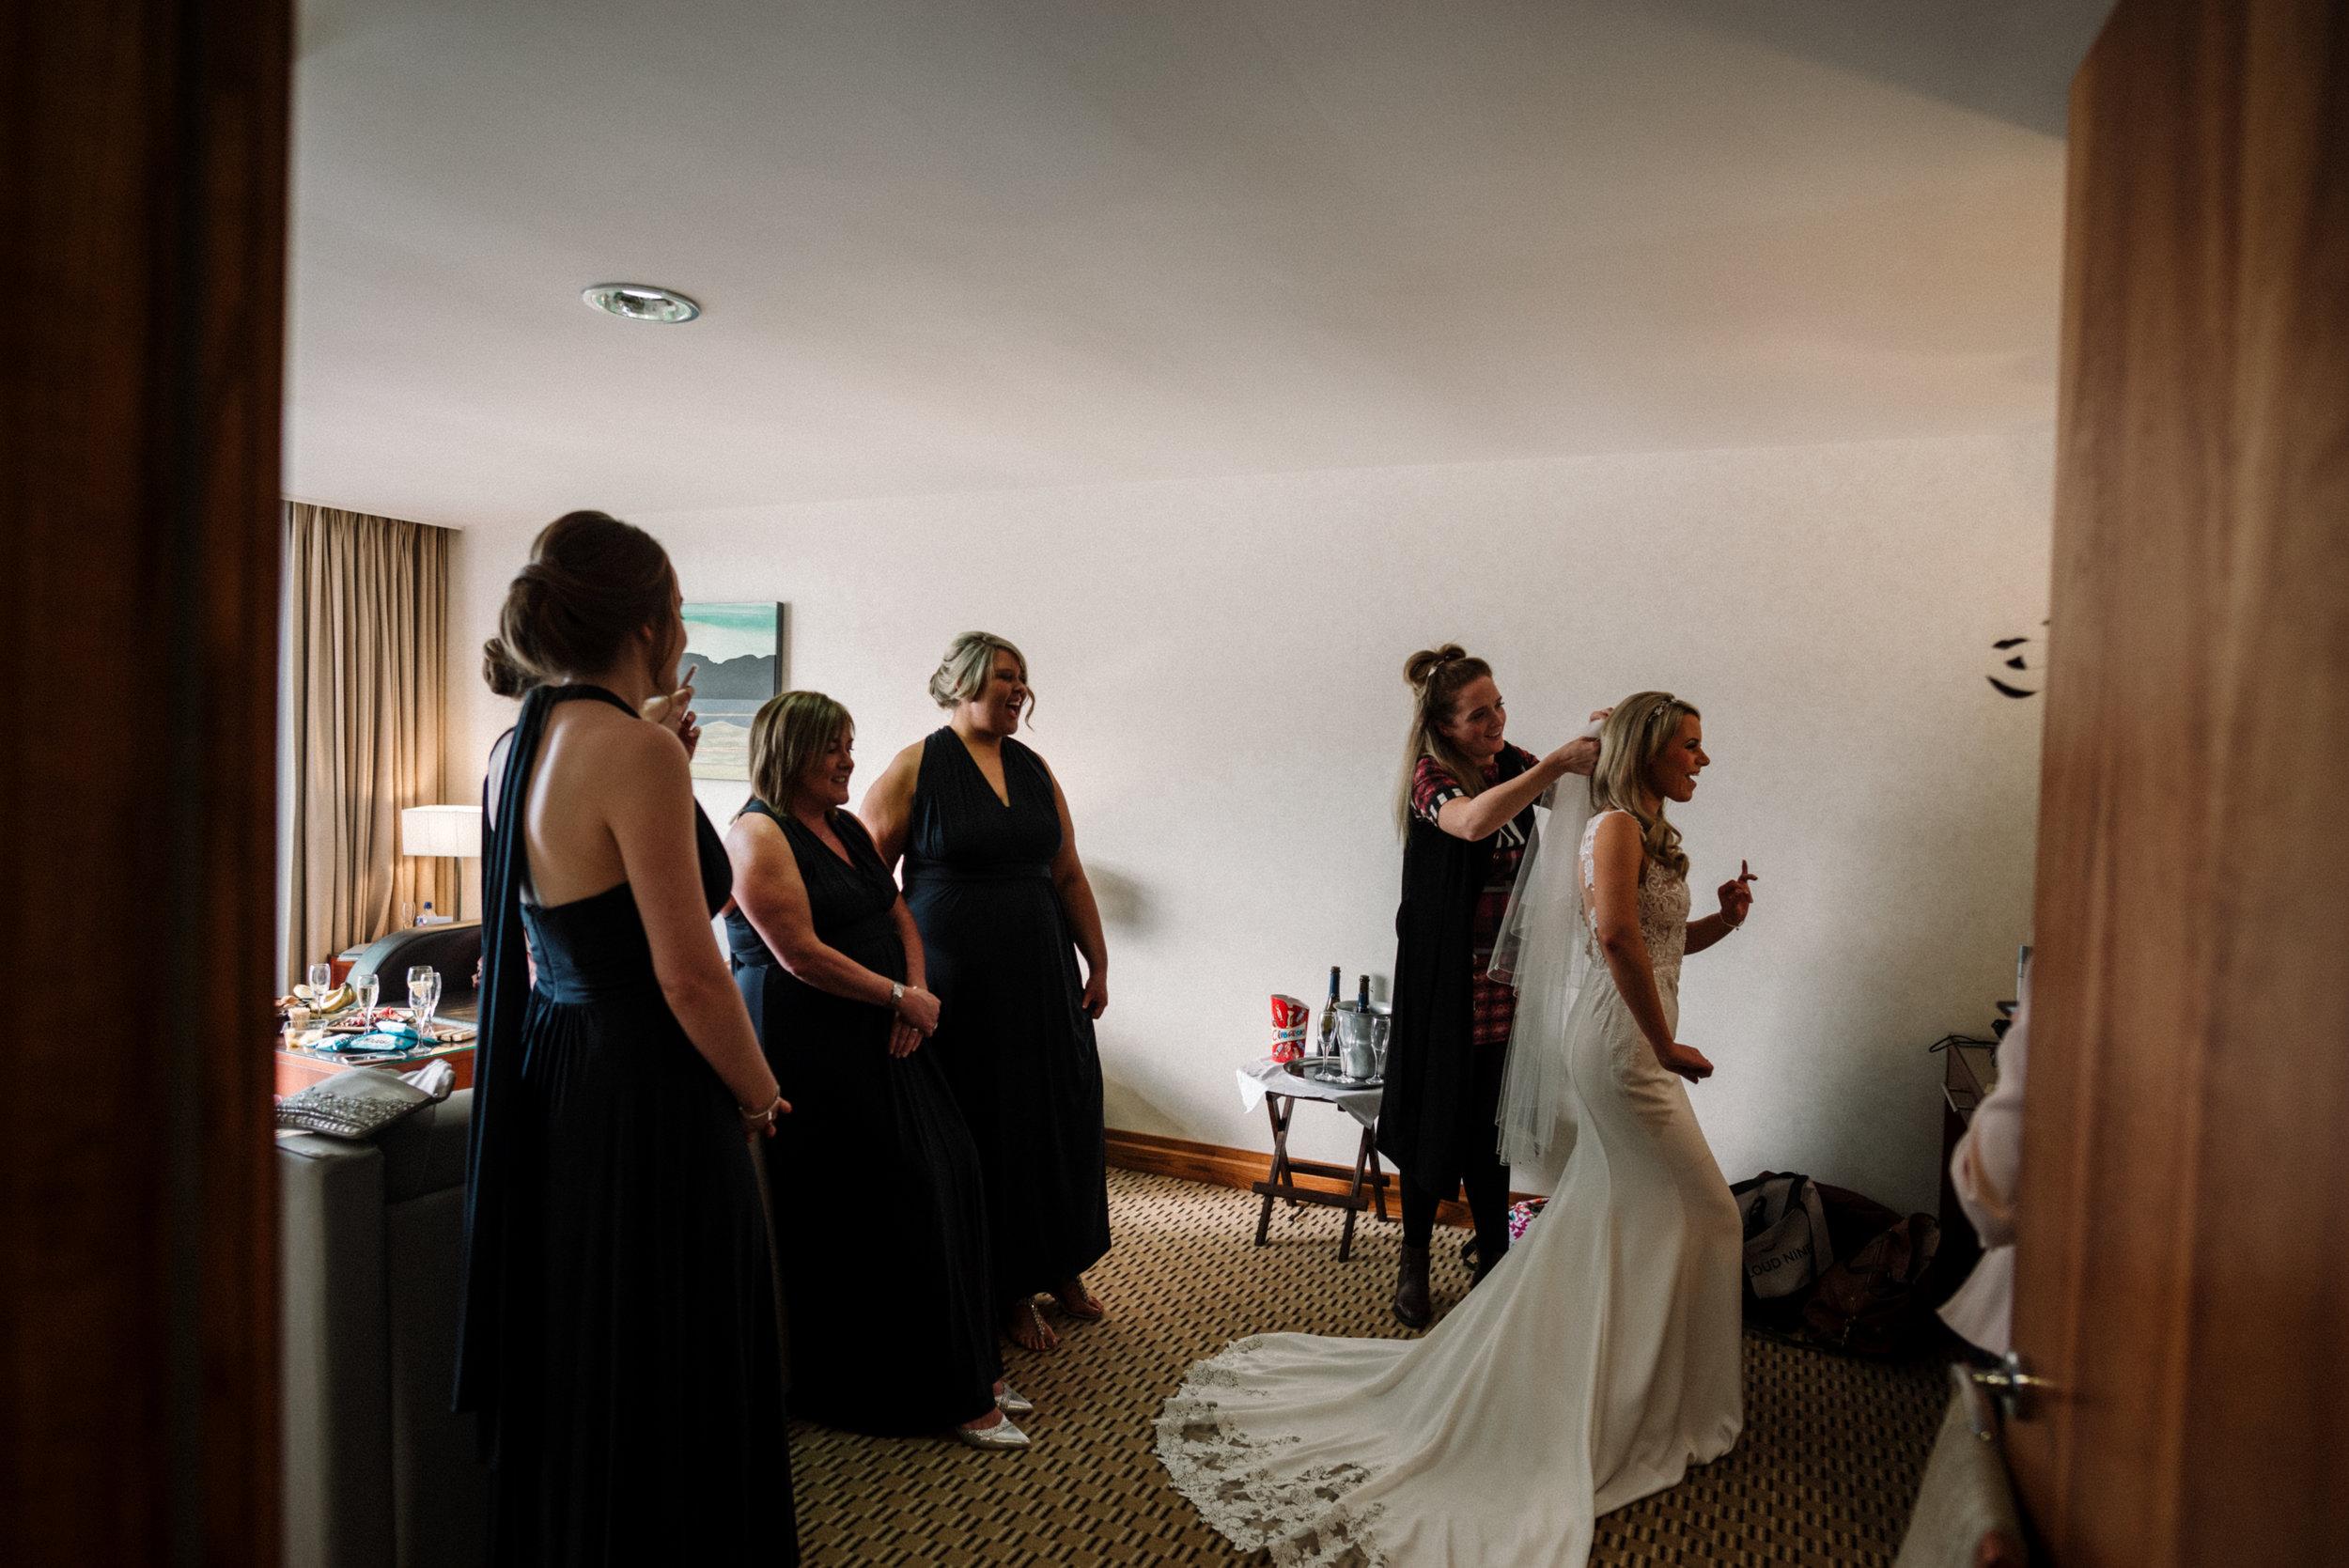 wales-wedding-photographer (11).jpg